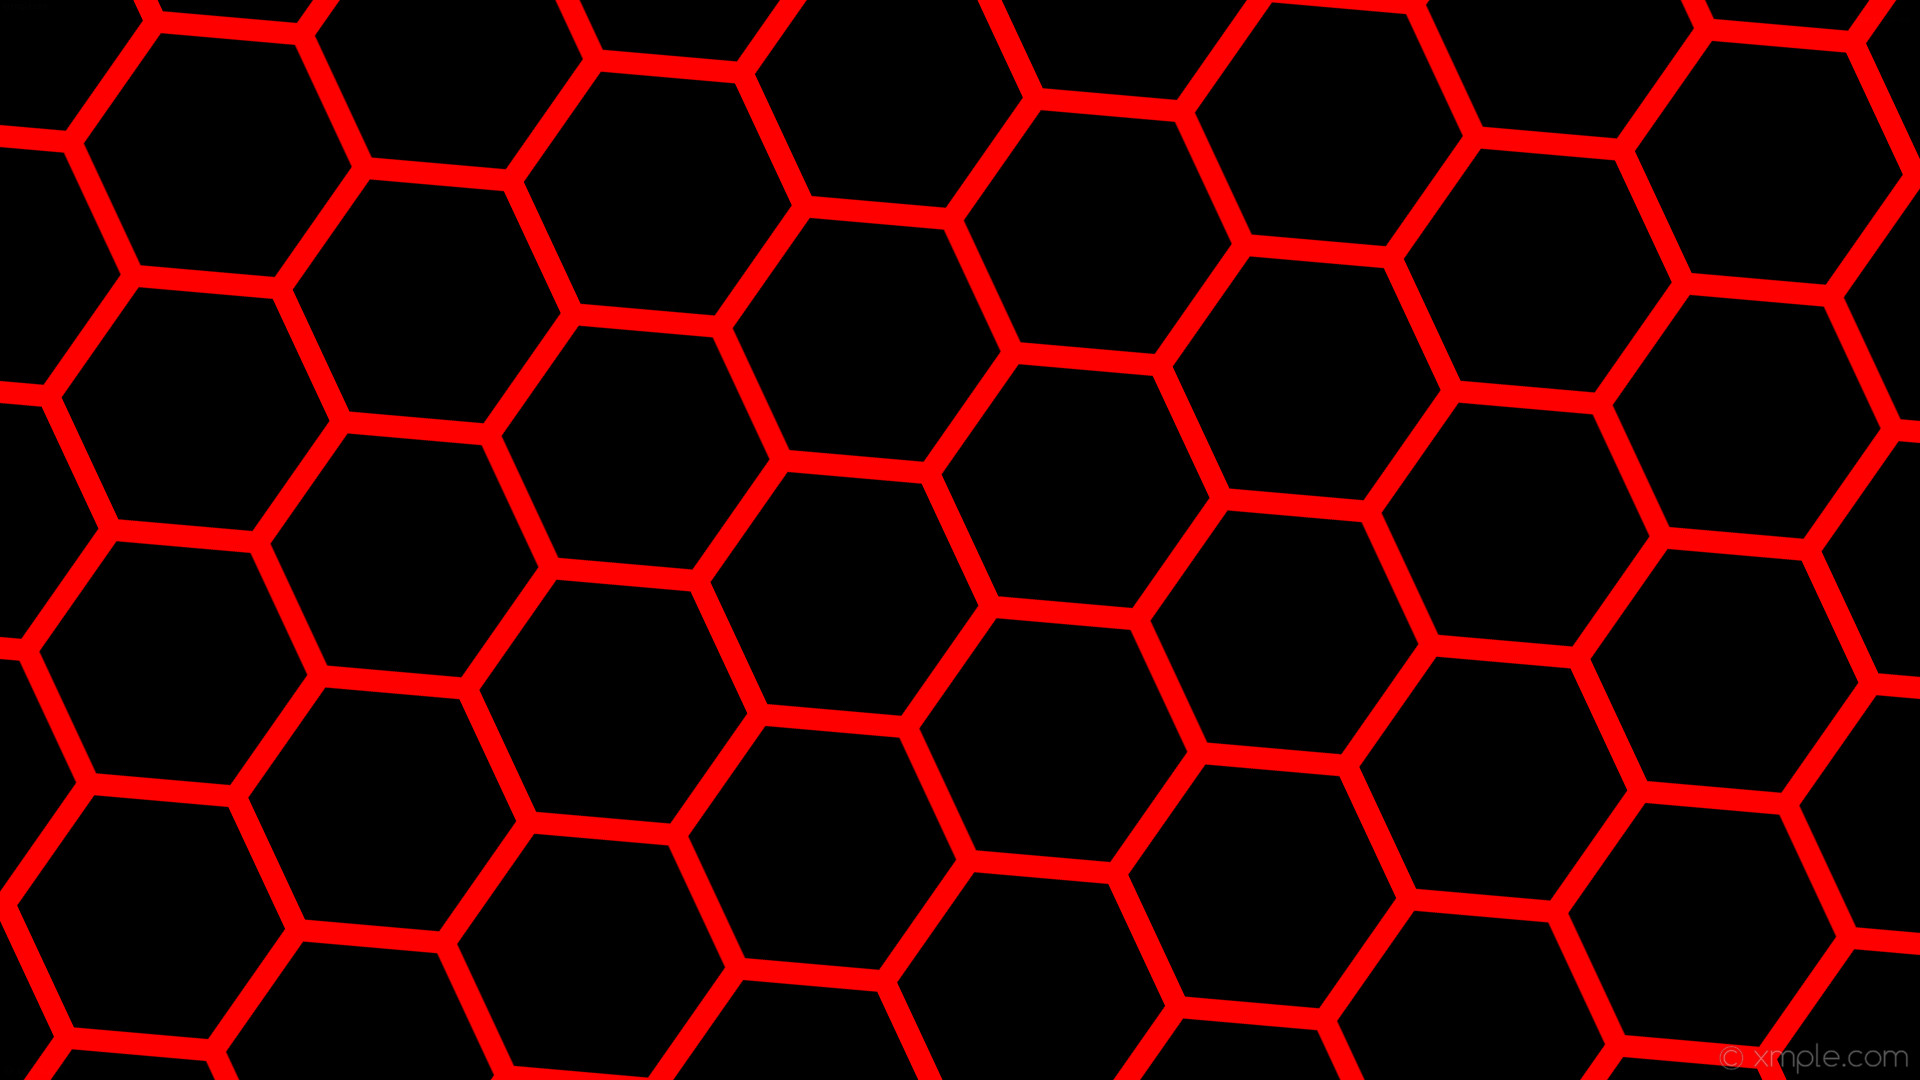 wallpaper red honeycomb black hexagon beehive #000000 #ff0000 diagonal 25°  22px 255px